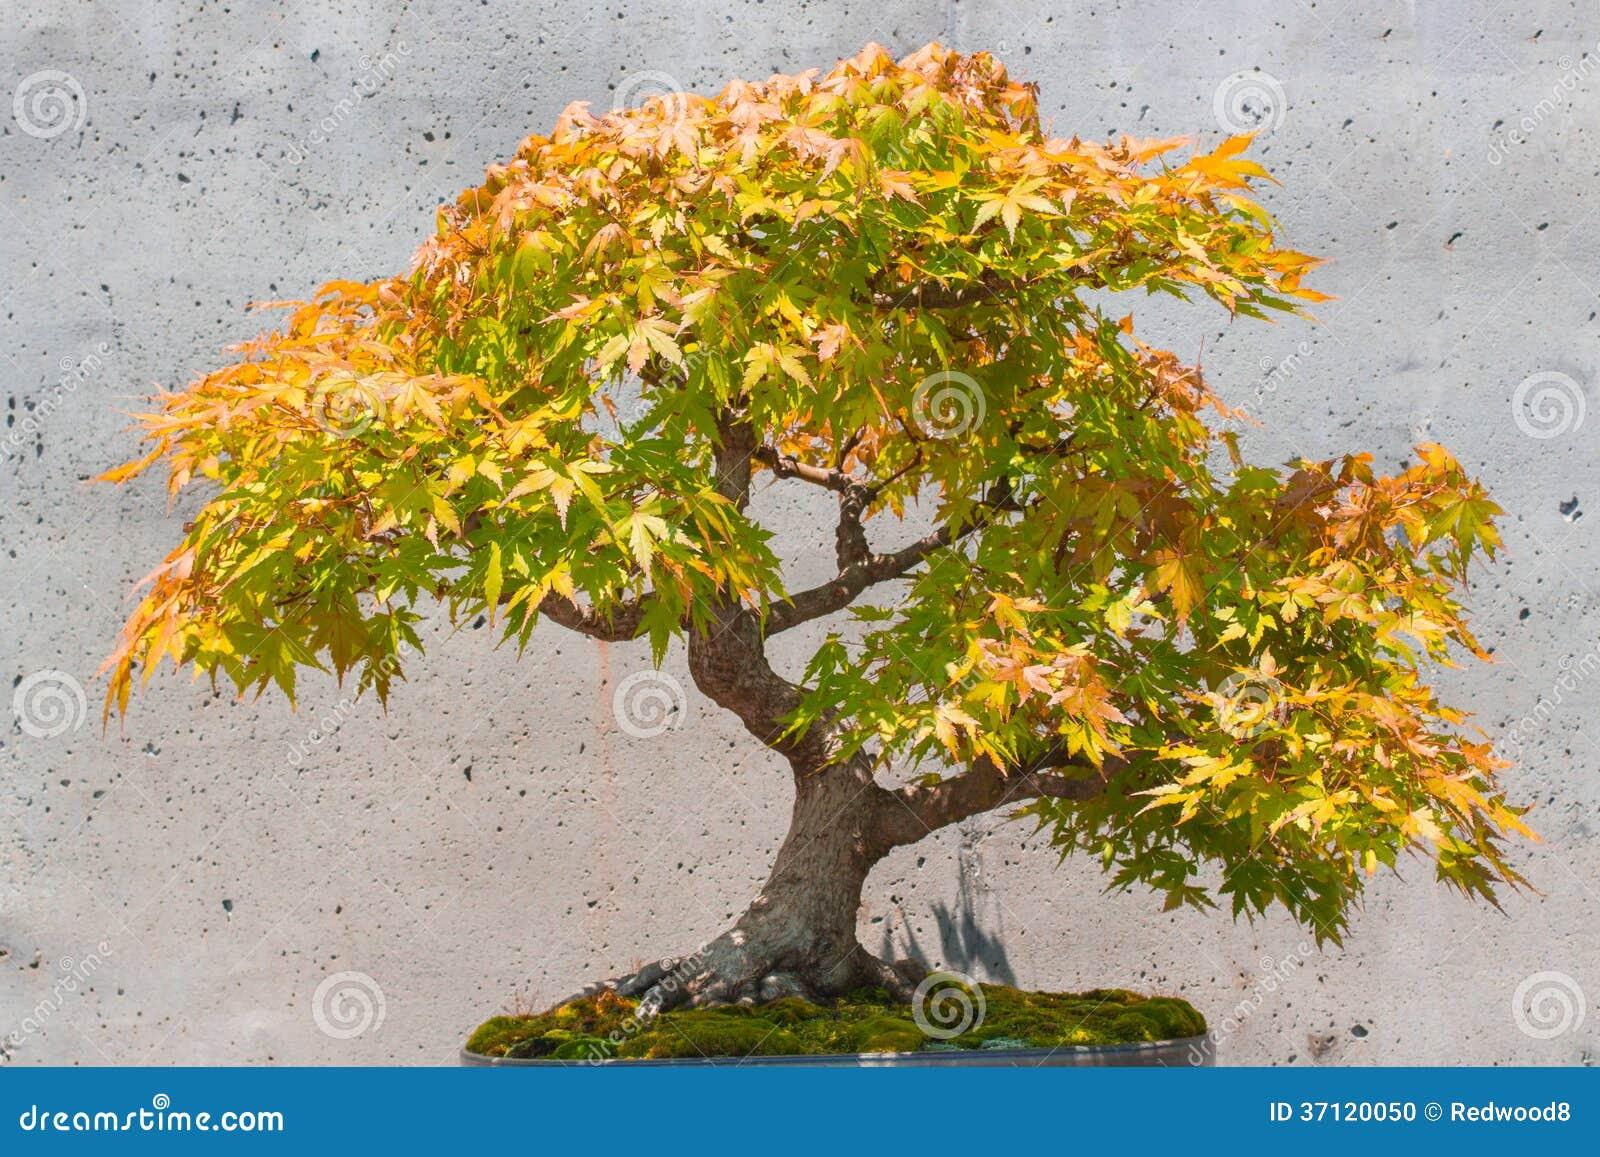 japanischer ahorn bonsai baum stockfoto bild 37120050. Black Bedroom Furniture Sets. Home Design Ideas